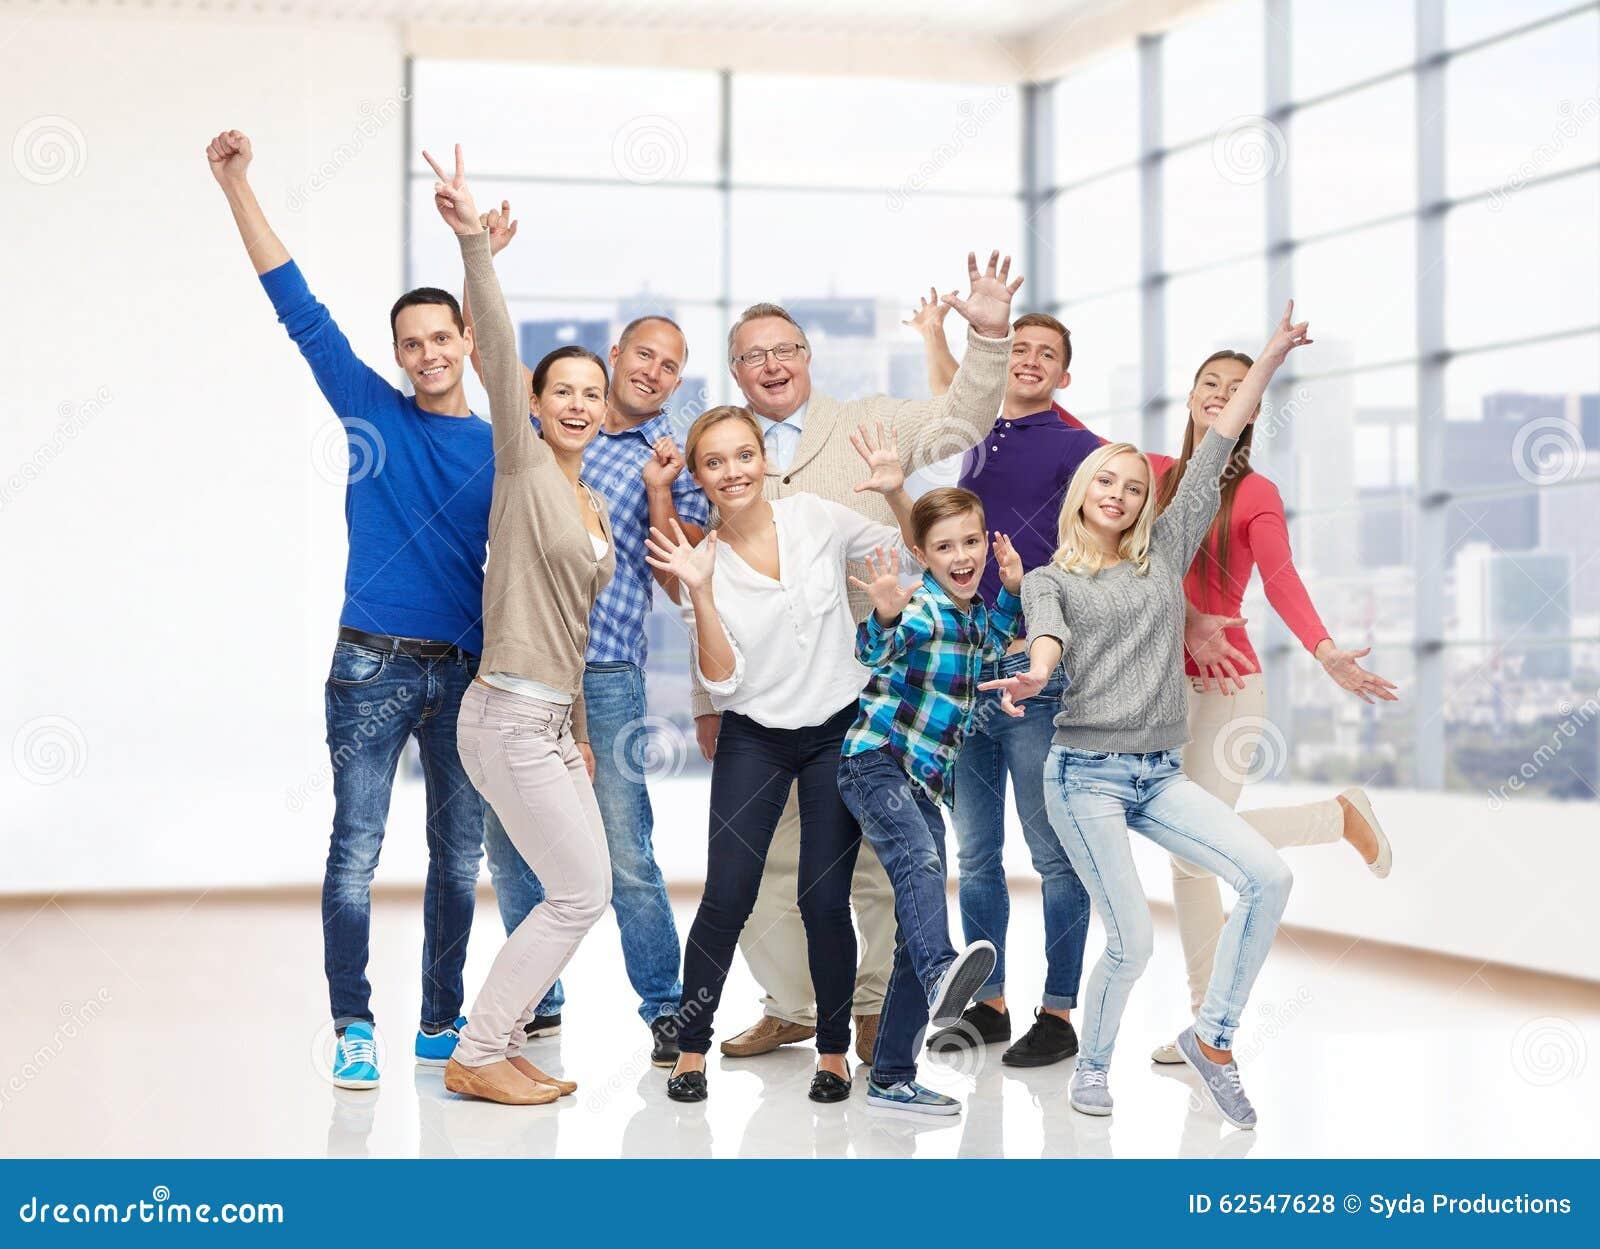 Group Of Smiling People Having Fun Stock Photo - Image ...